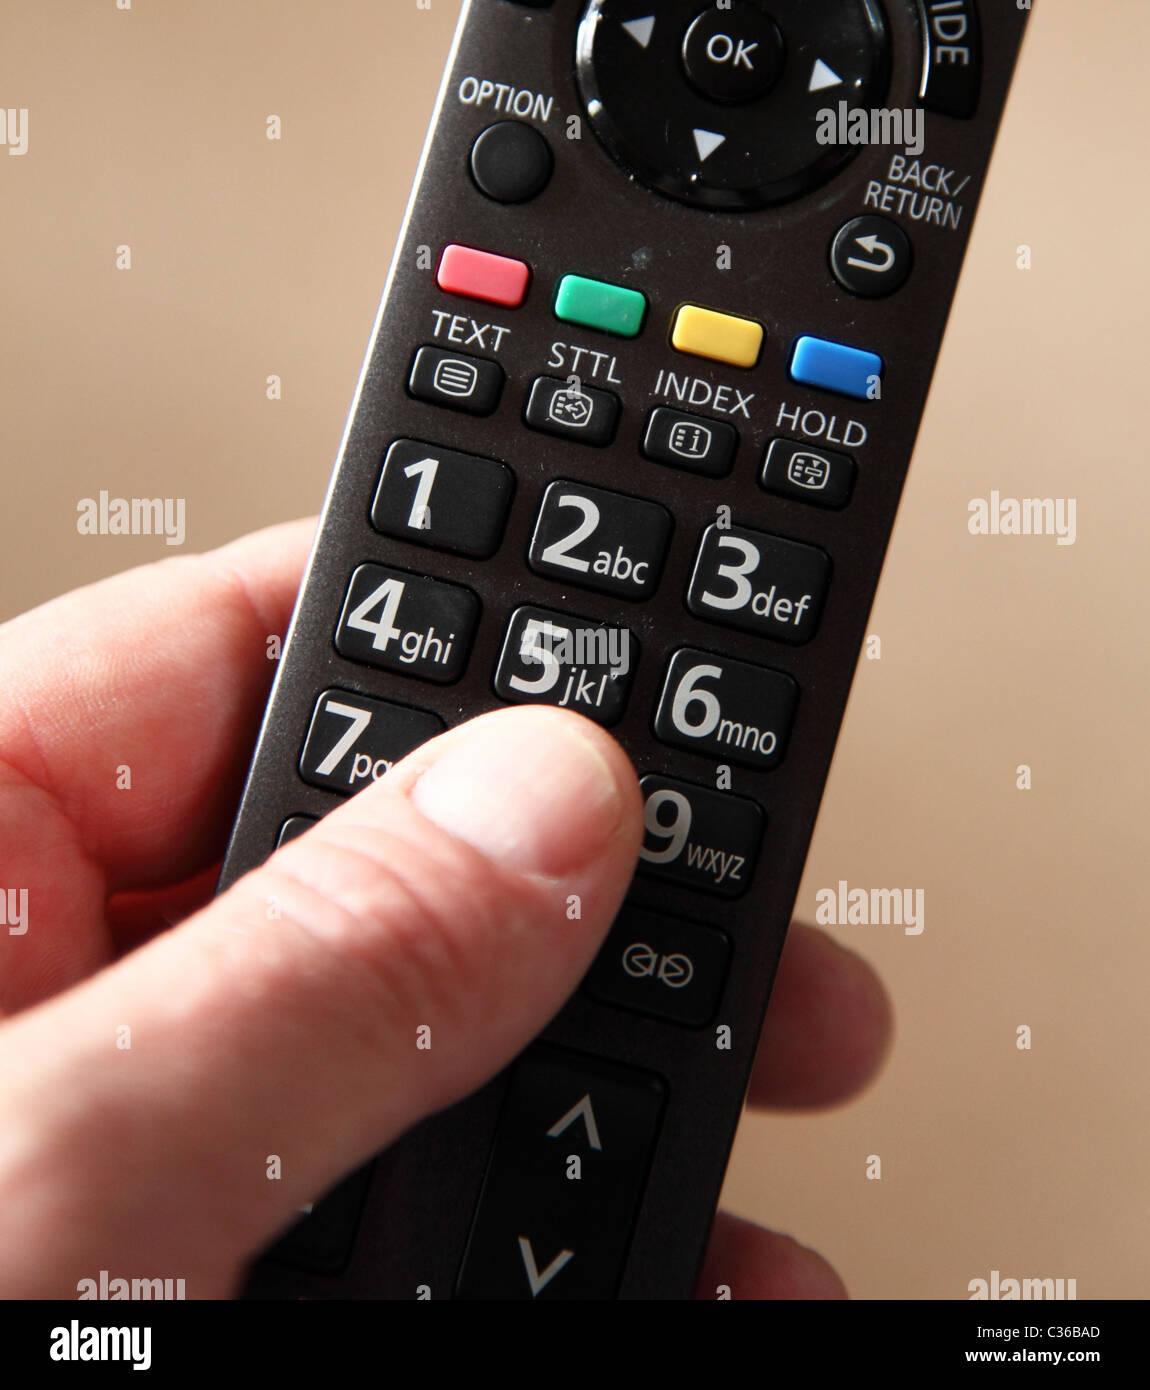 A digital TV remote control. - Stock Image